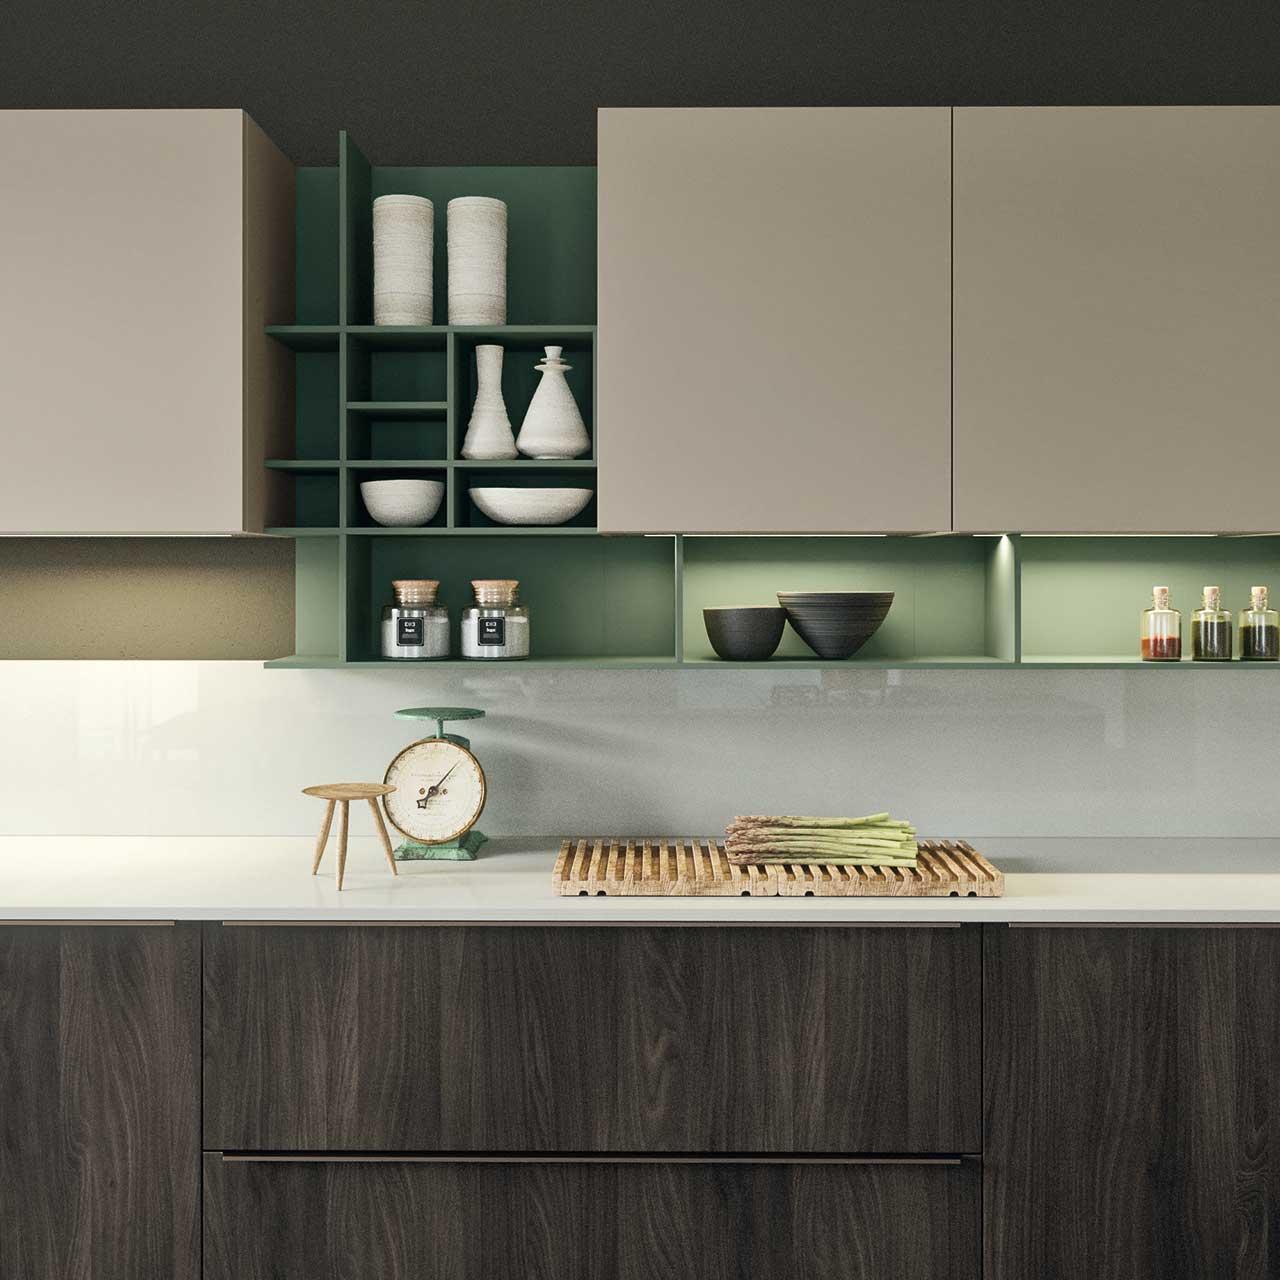 Cucina linear 08 antares particolare zona giorno - Cucina particolare ...